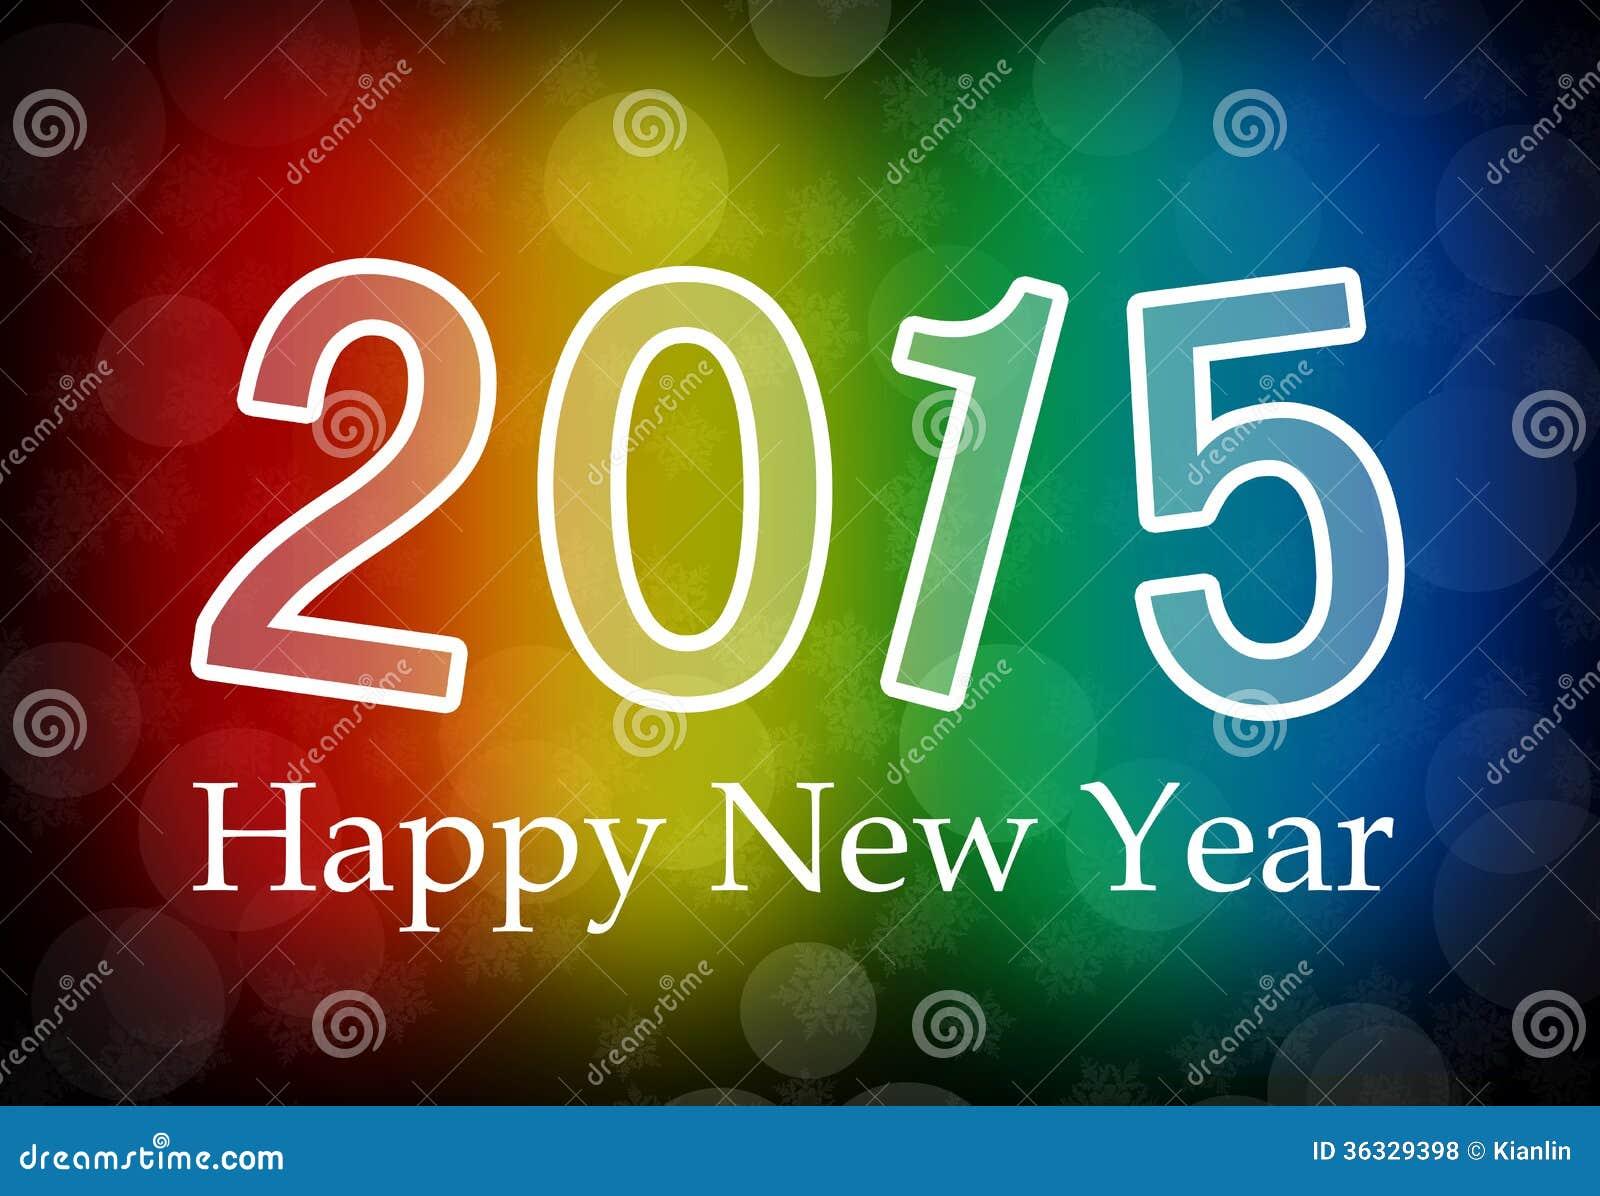 Royalty Free Stock Photos: 2015 Happy New Year